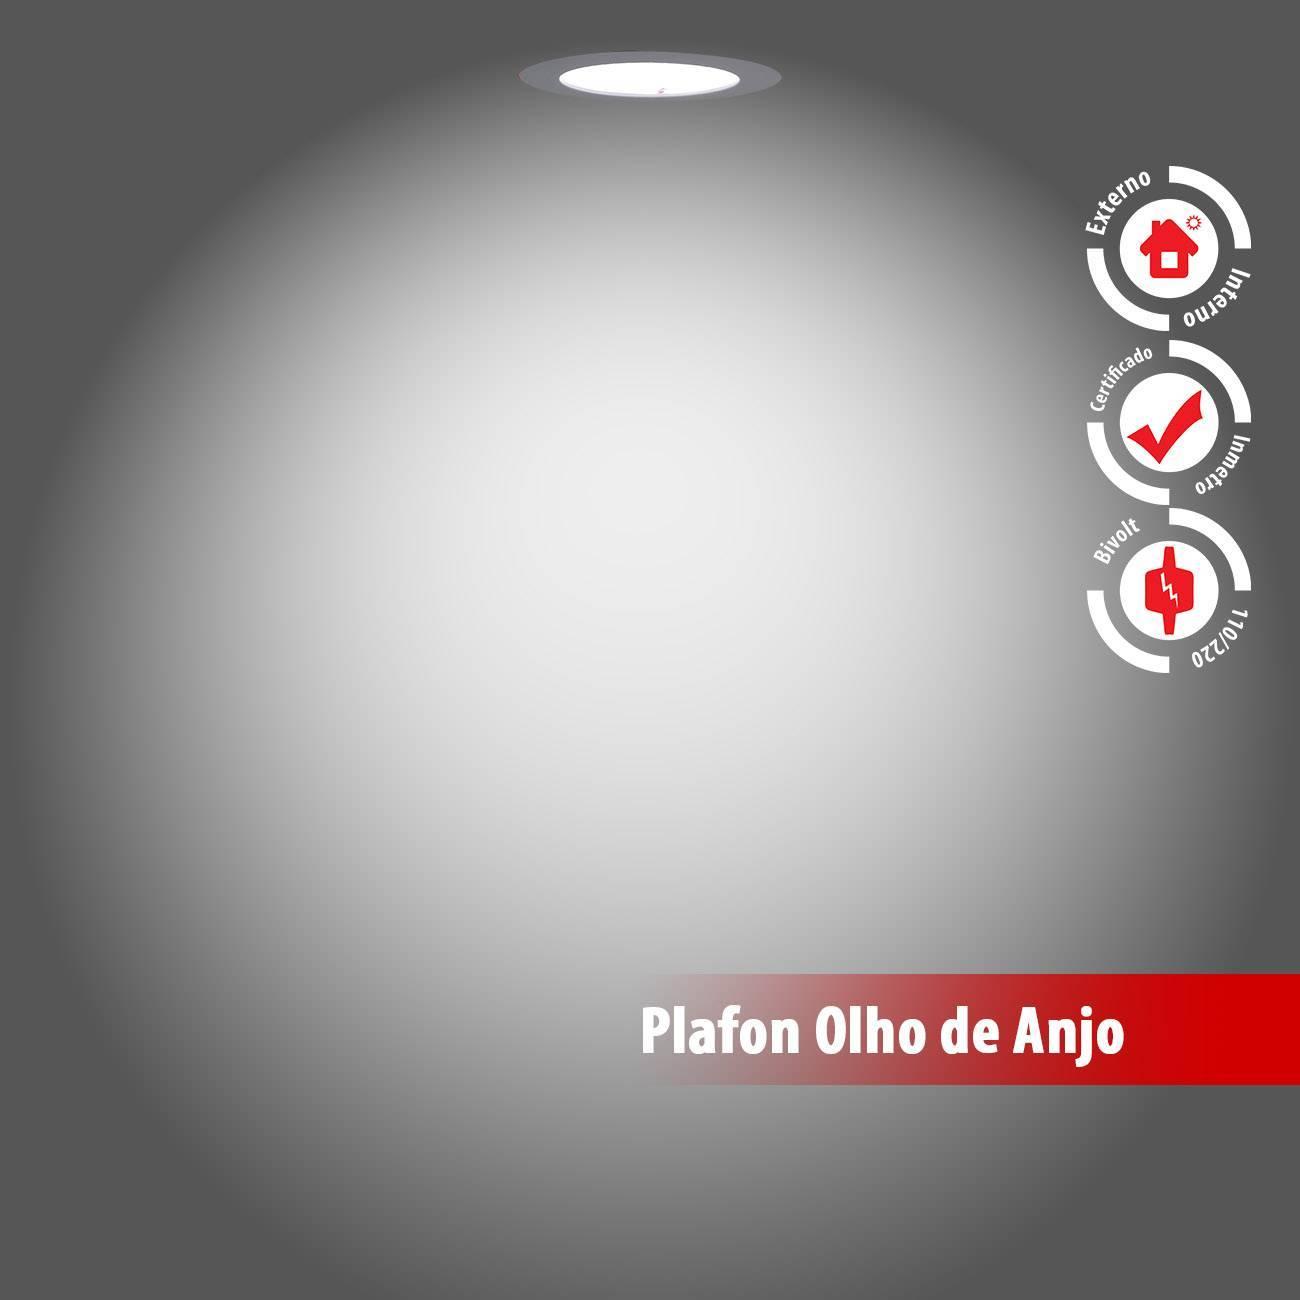 Luminária Plafon Led Embutir Slim 18w 6000k Branco Frio - LCGELETRO